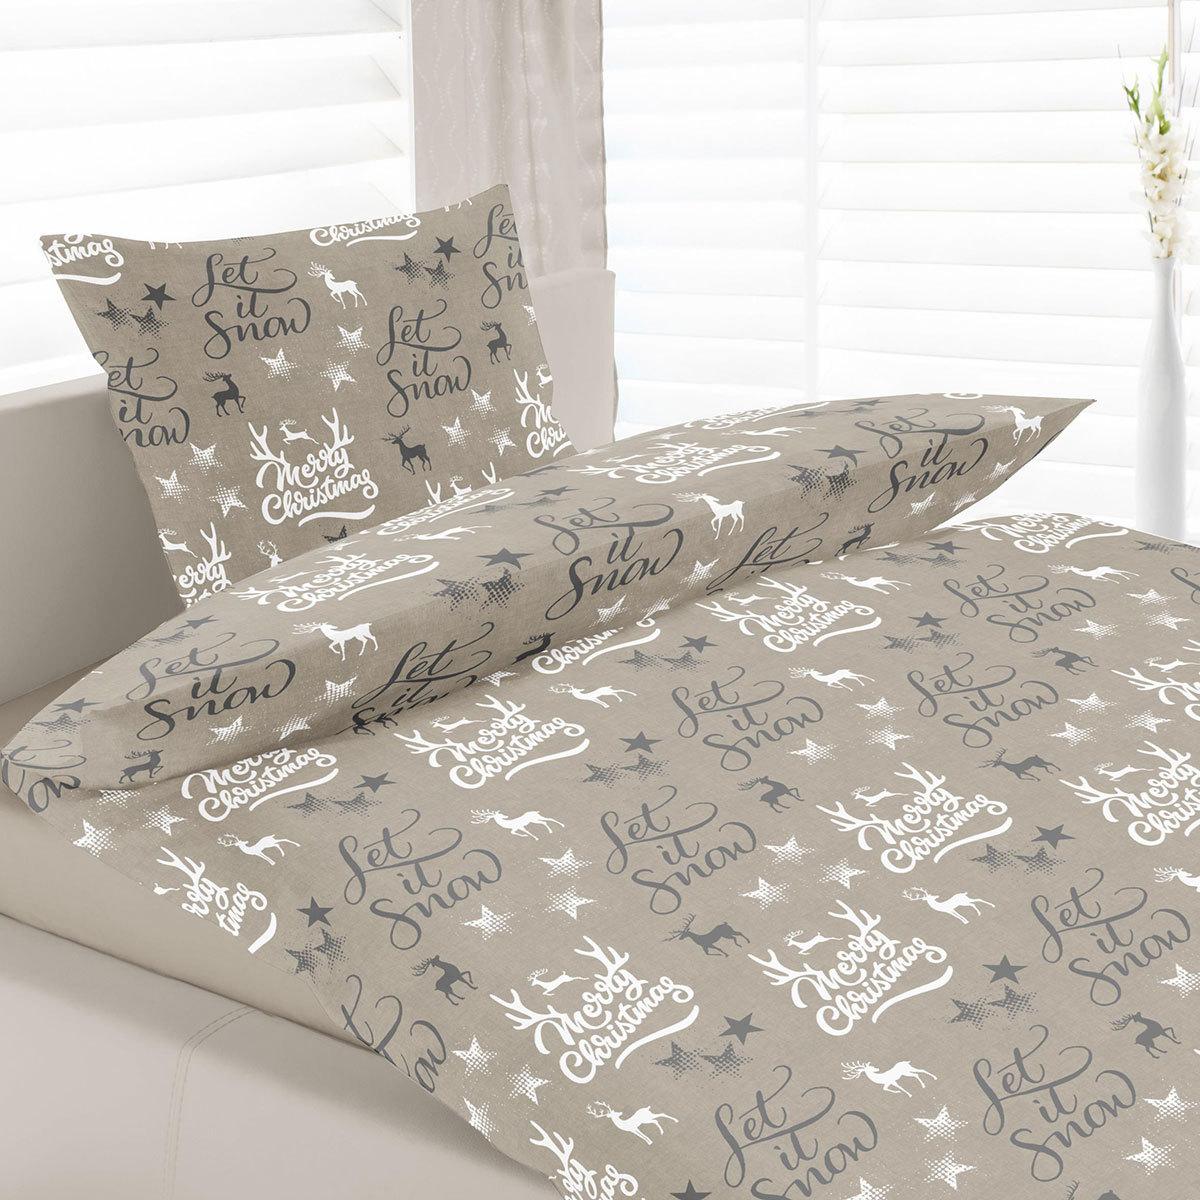 sun garden bettw sche merry christmas beige g nstig online kaufen bei bettwaren shop. Black Bedroom Furniture Sets. Home Design Ideas